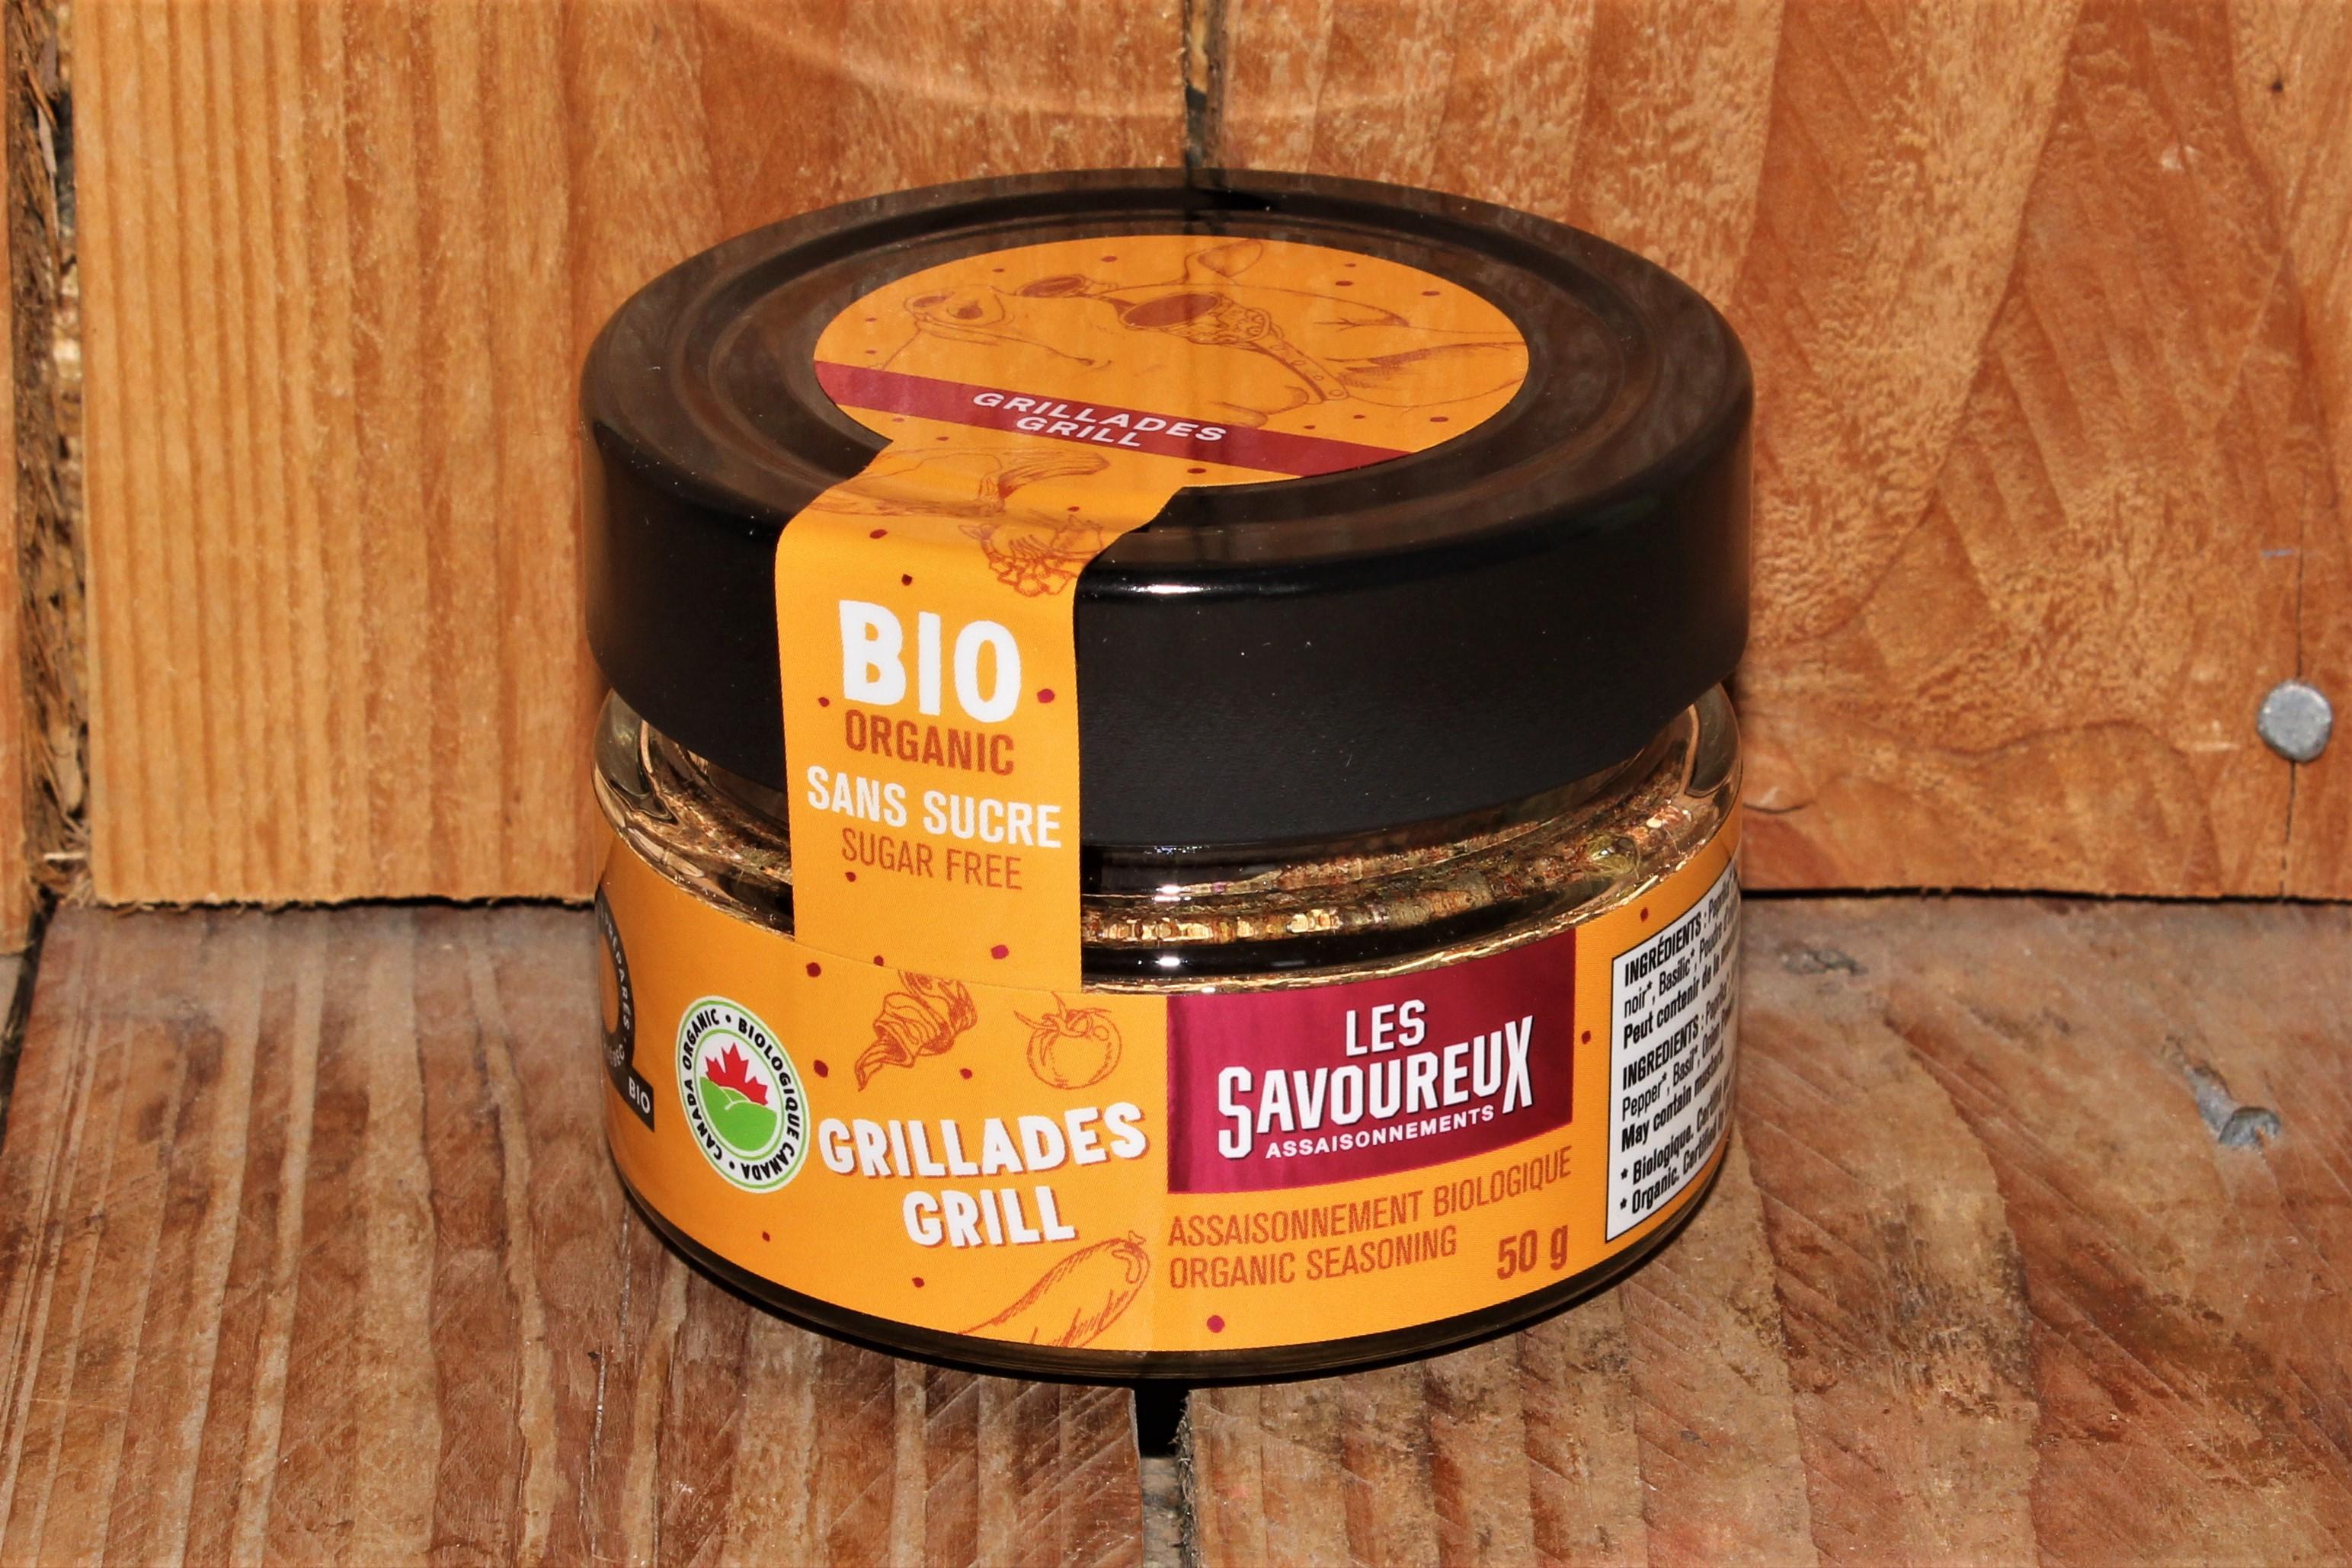 Les Savoureux – Oragnic seasoning, Grill *sugar-free* (50g)